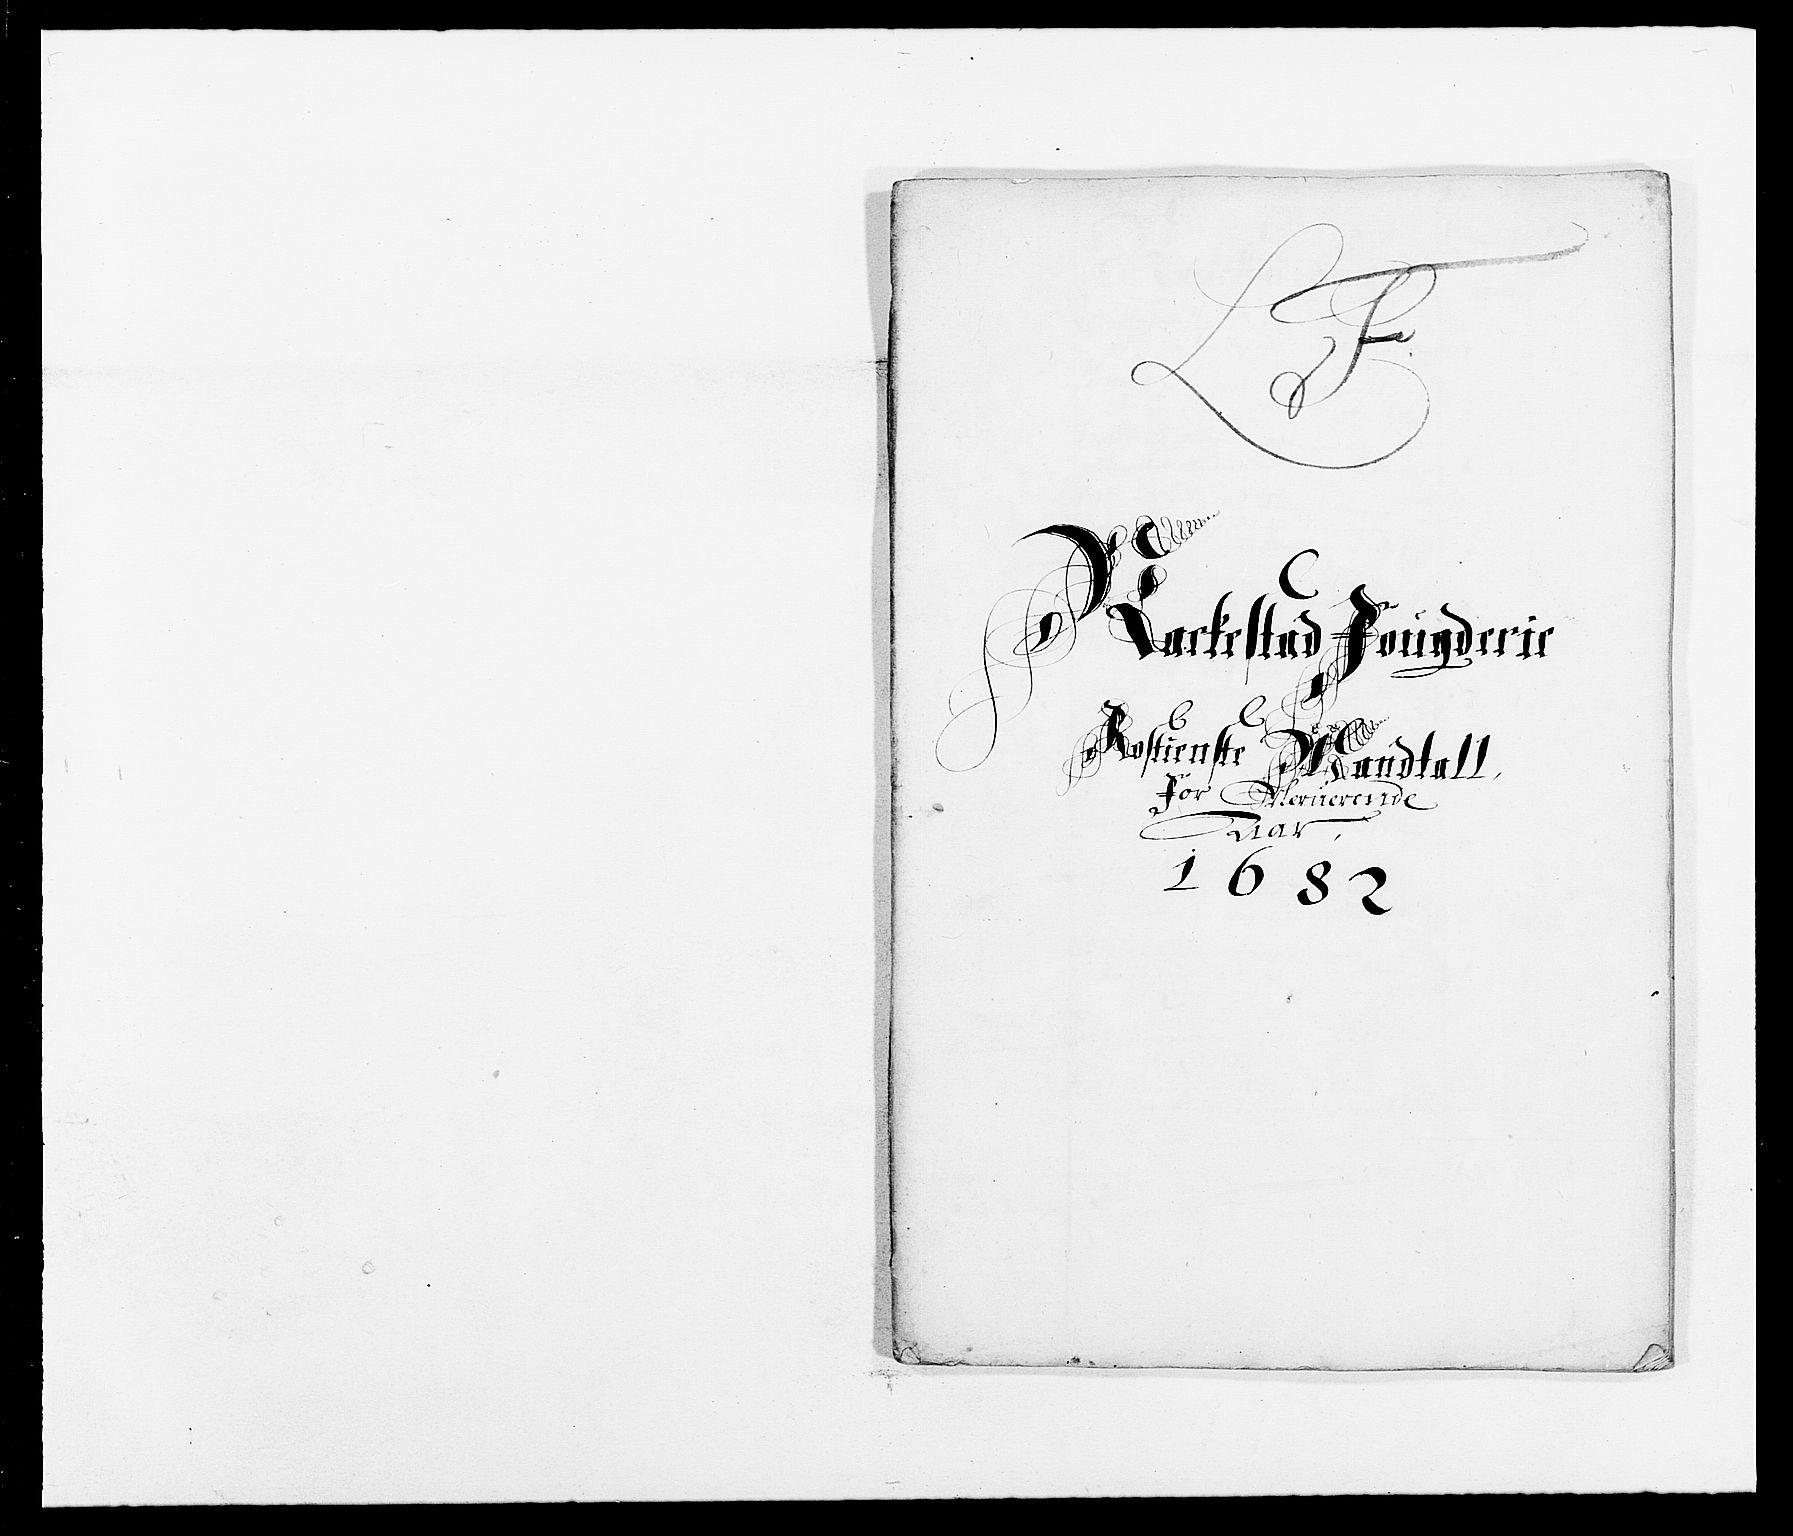 RA, Rentekammeret inntil 1814, Reviderte regnskaper, Fogderegnskap, R05/L0273: Fogderegnskap Rakkestad, 1682, s. 125